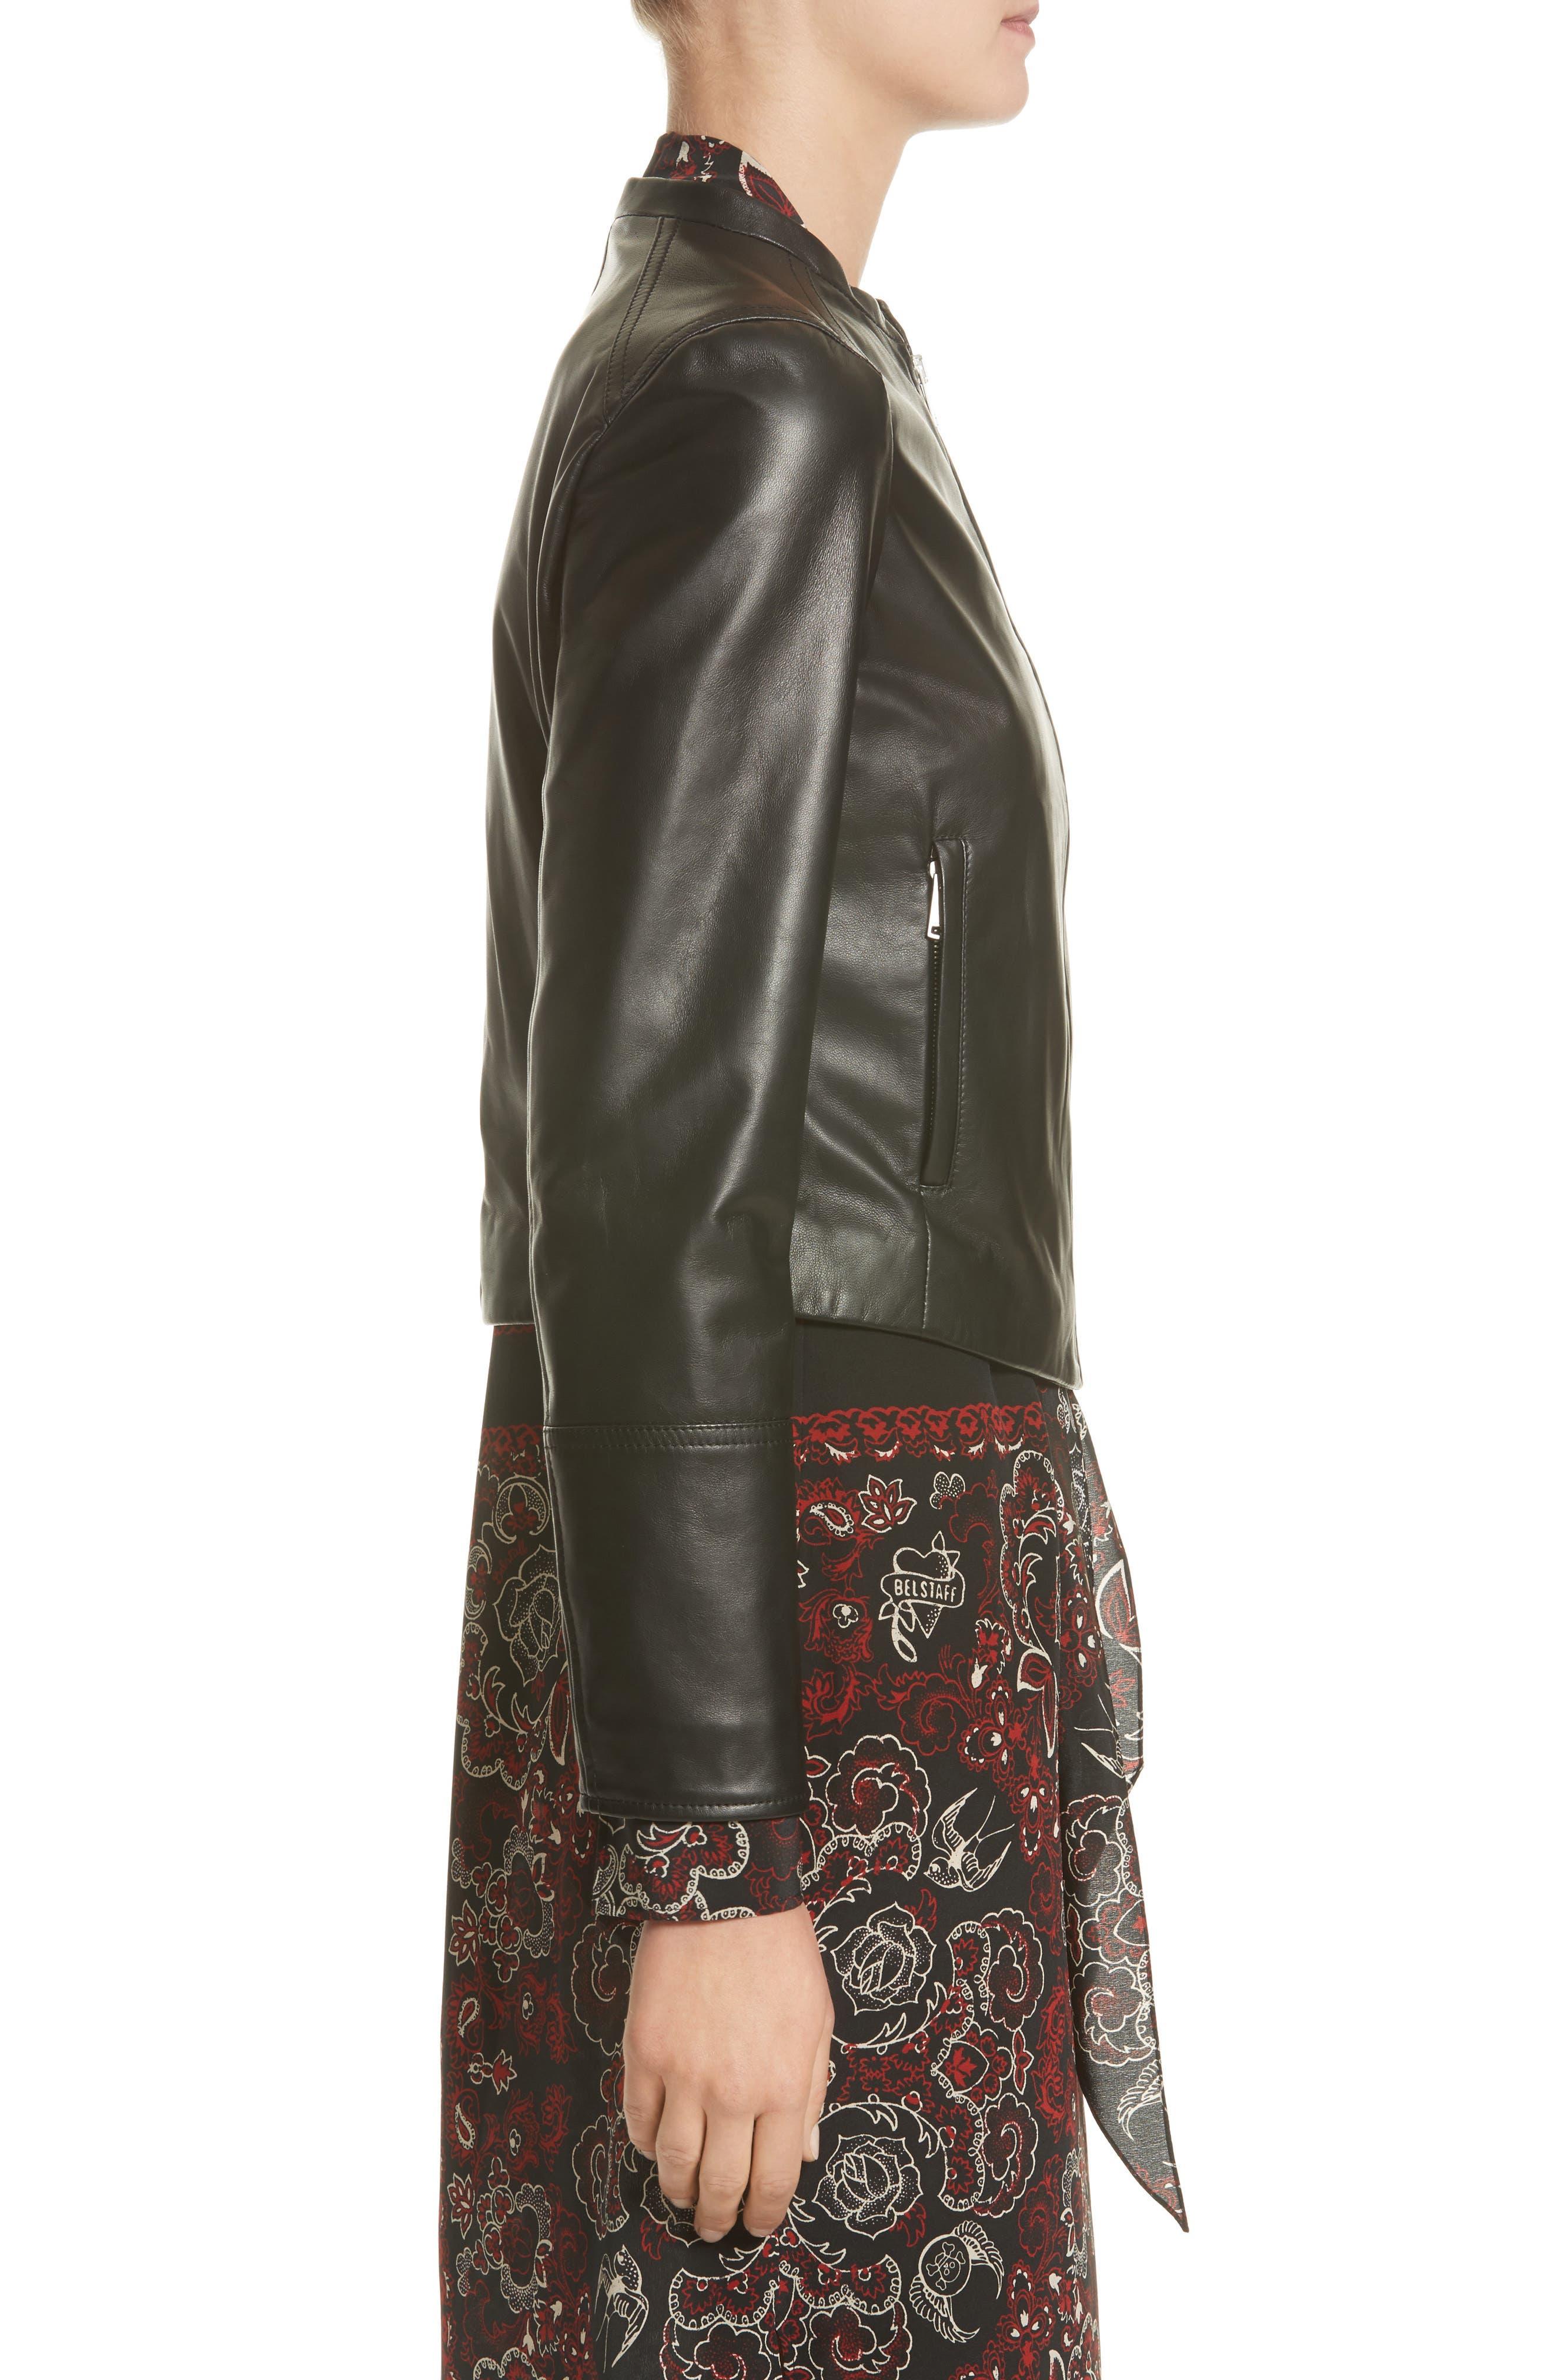 Carrack Leather Jacket,                             Alternate thumbnail 3, color,                             001